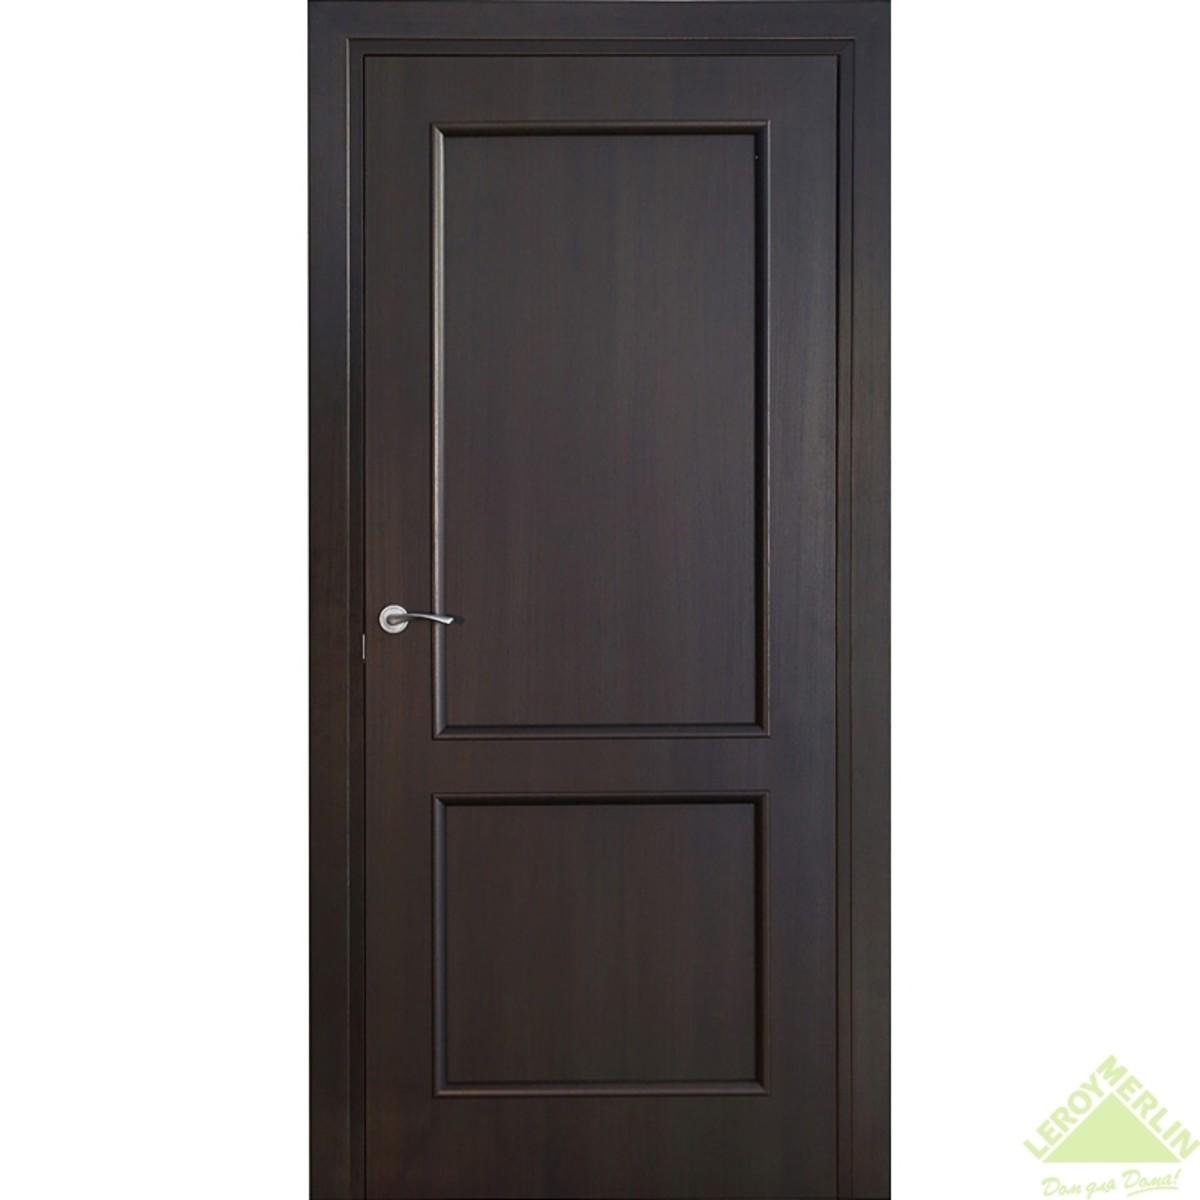 Дверь межкомнатная глухая Фортунато 820 900x2000 мм венге